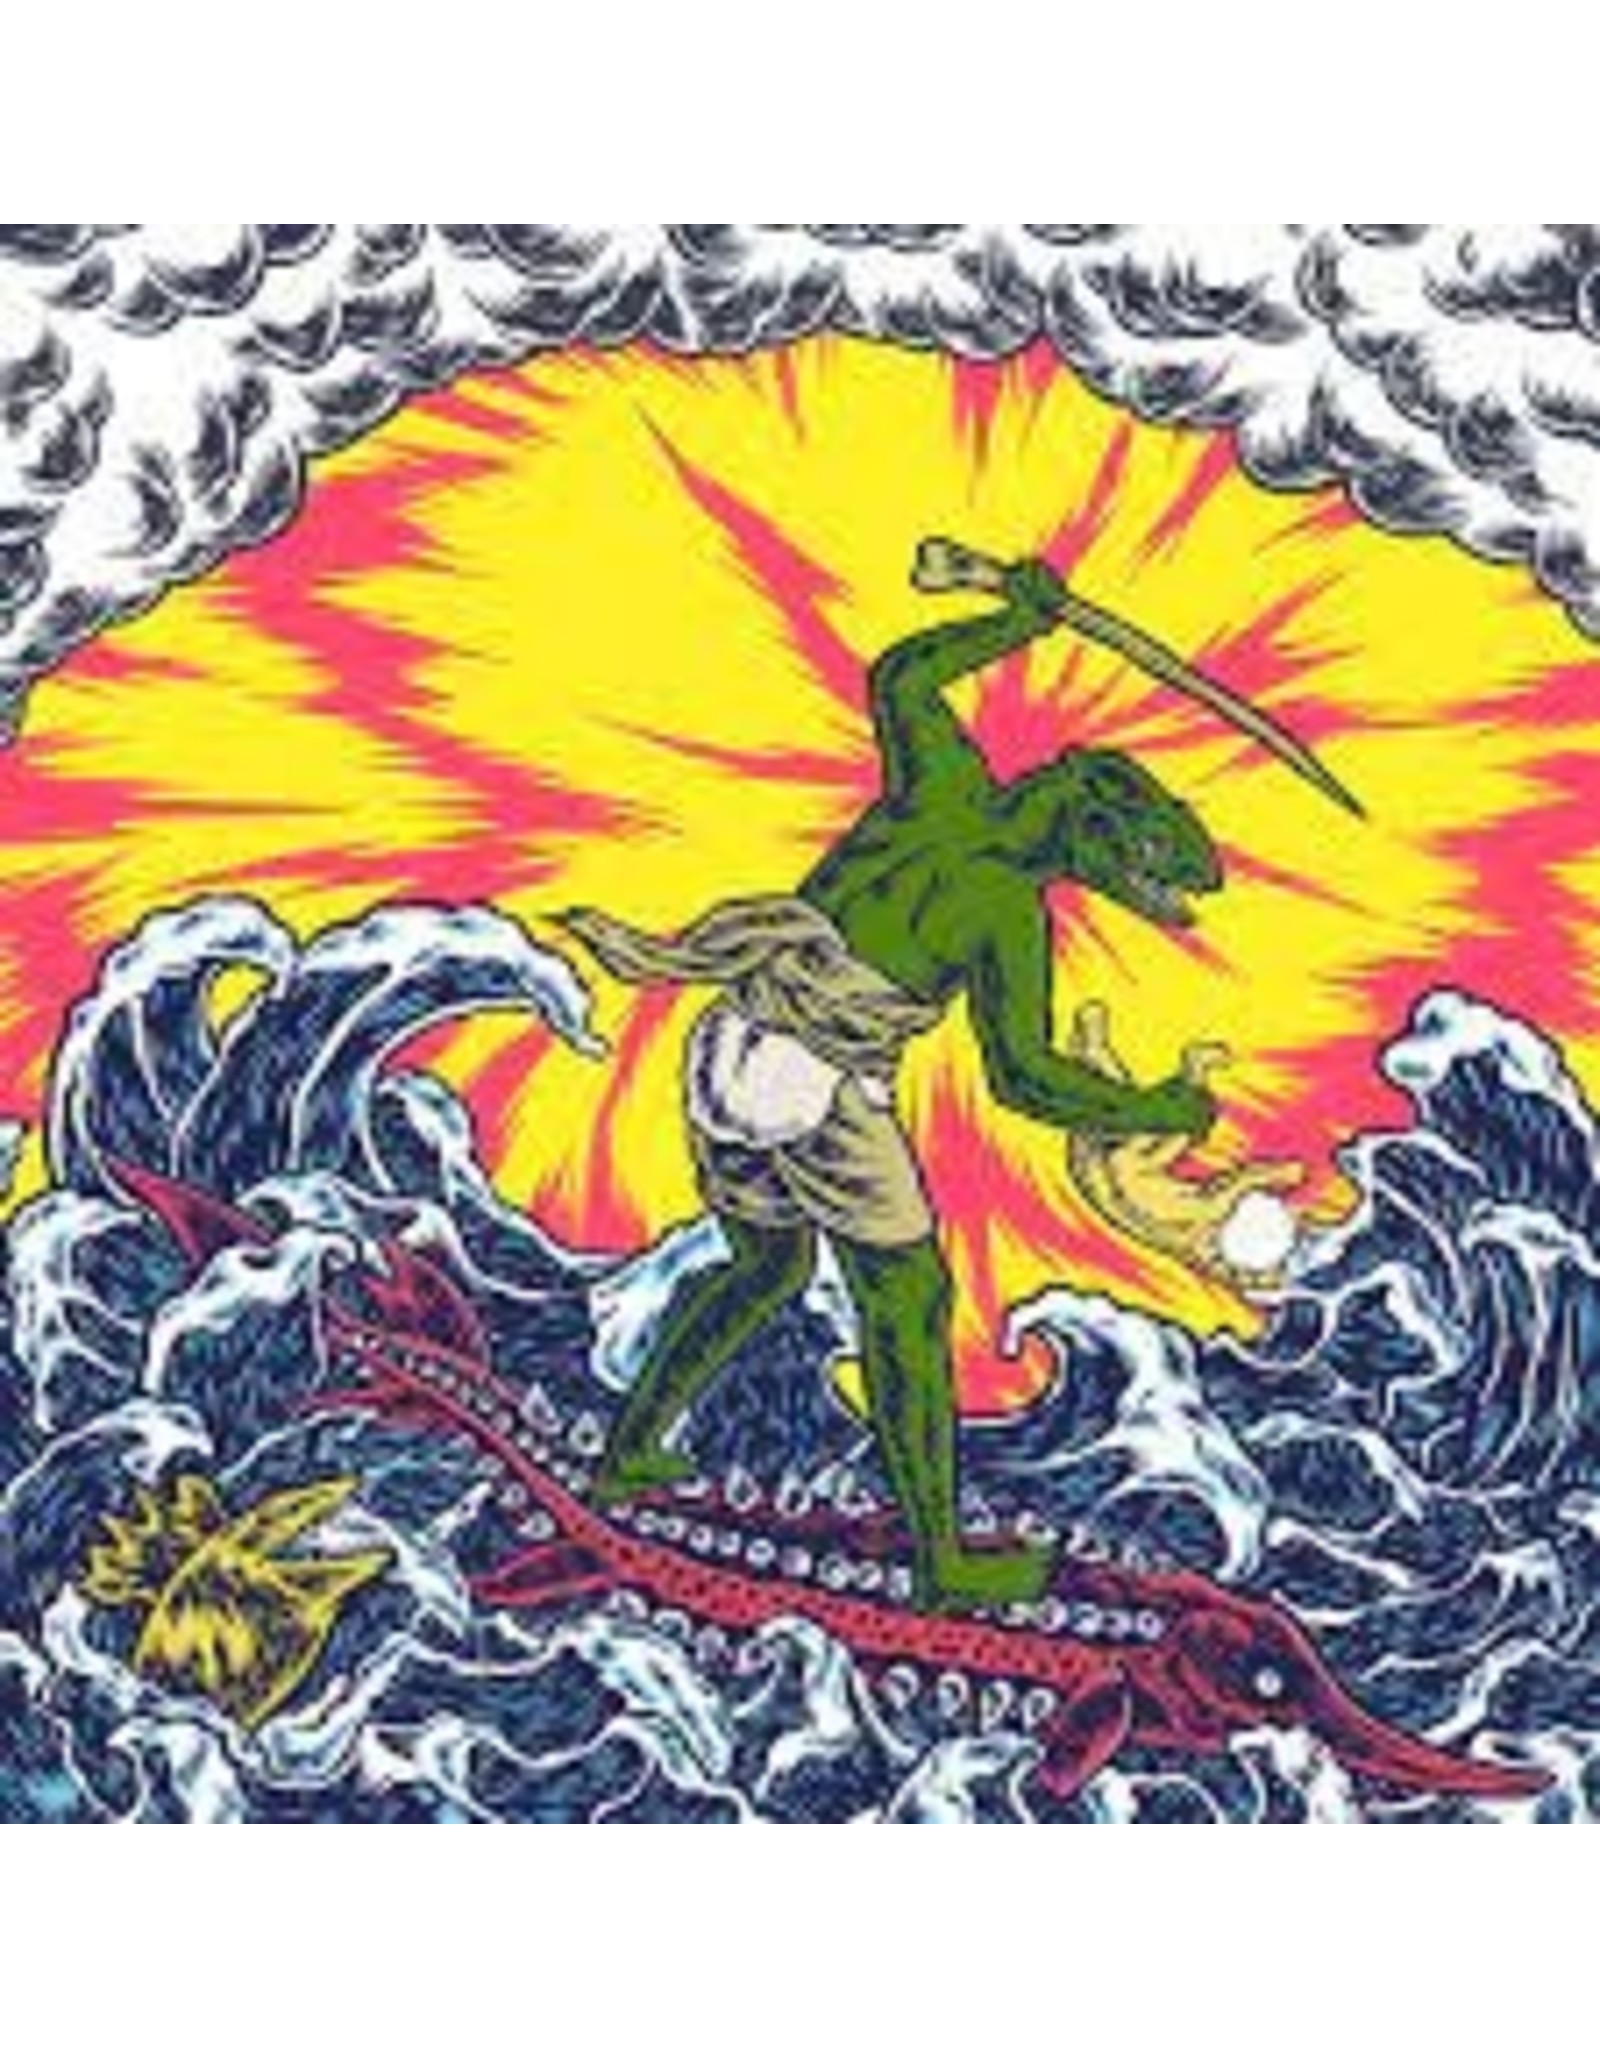 King Gizzard and the Lizard Wizard - Teenage Gizzard